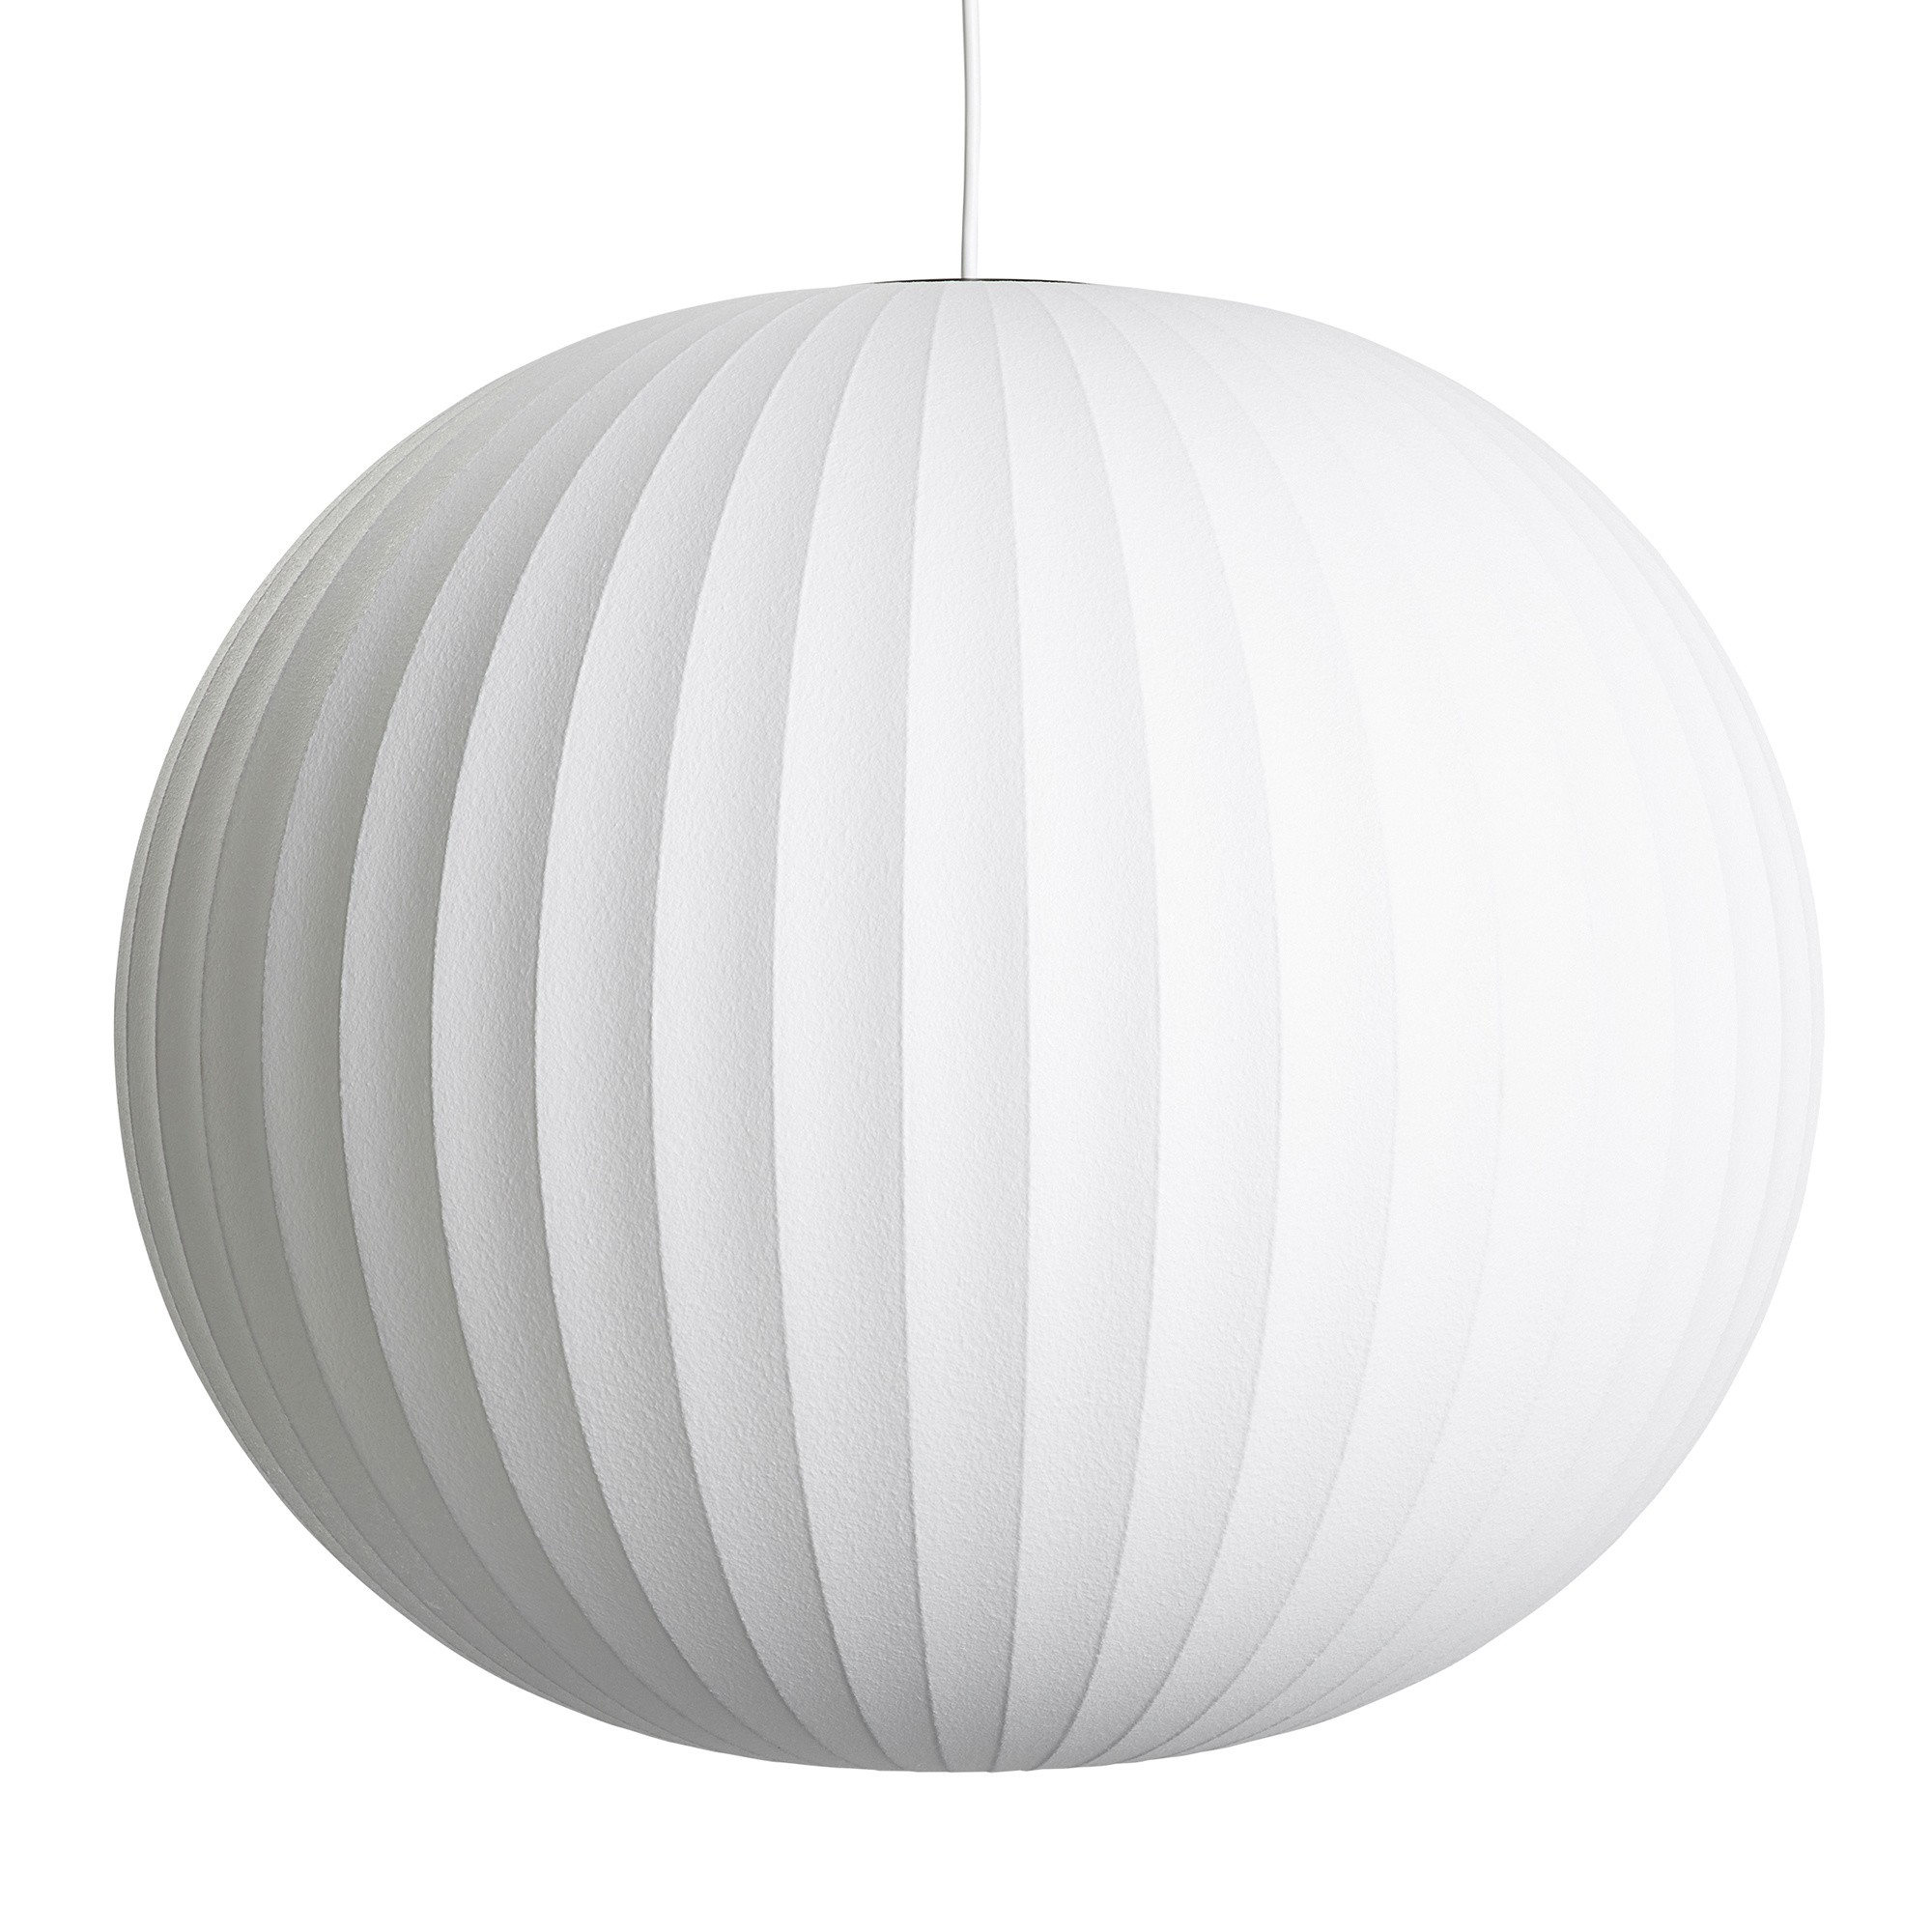 Hay Nelson Ball Bubble Suspension Lamp